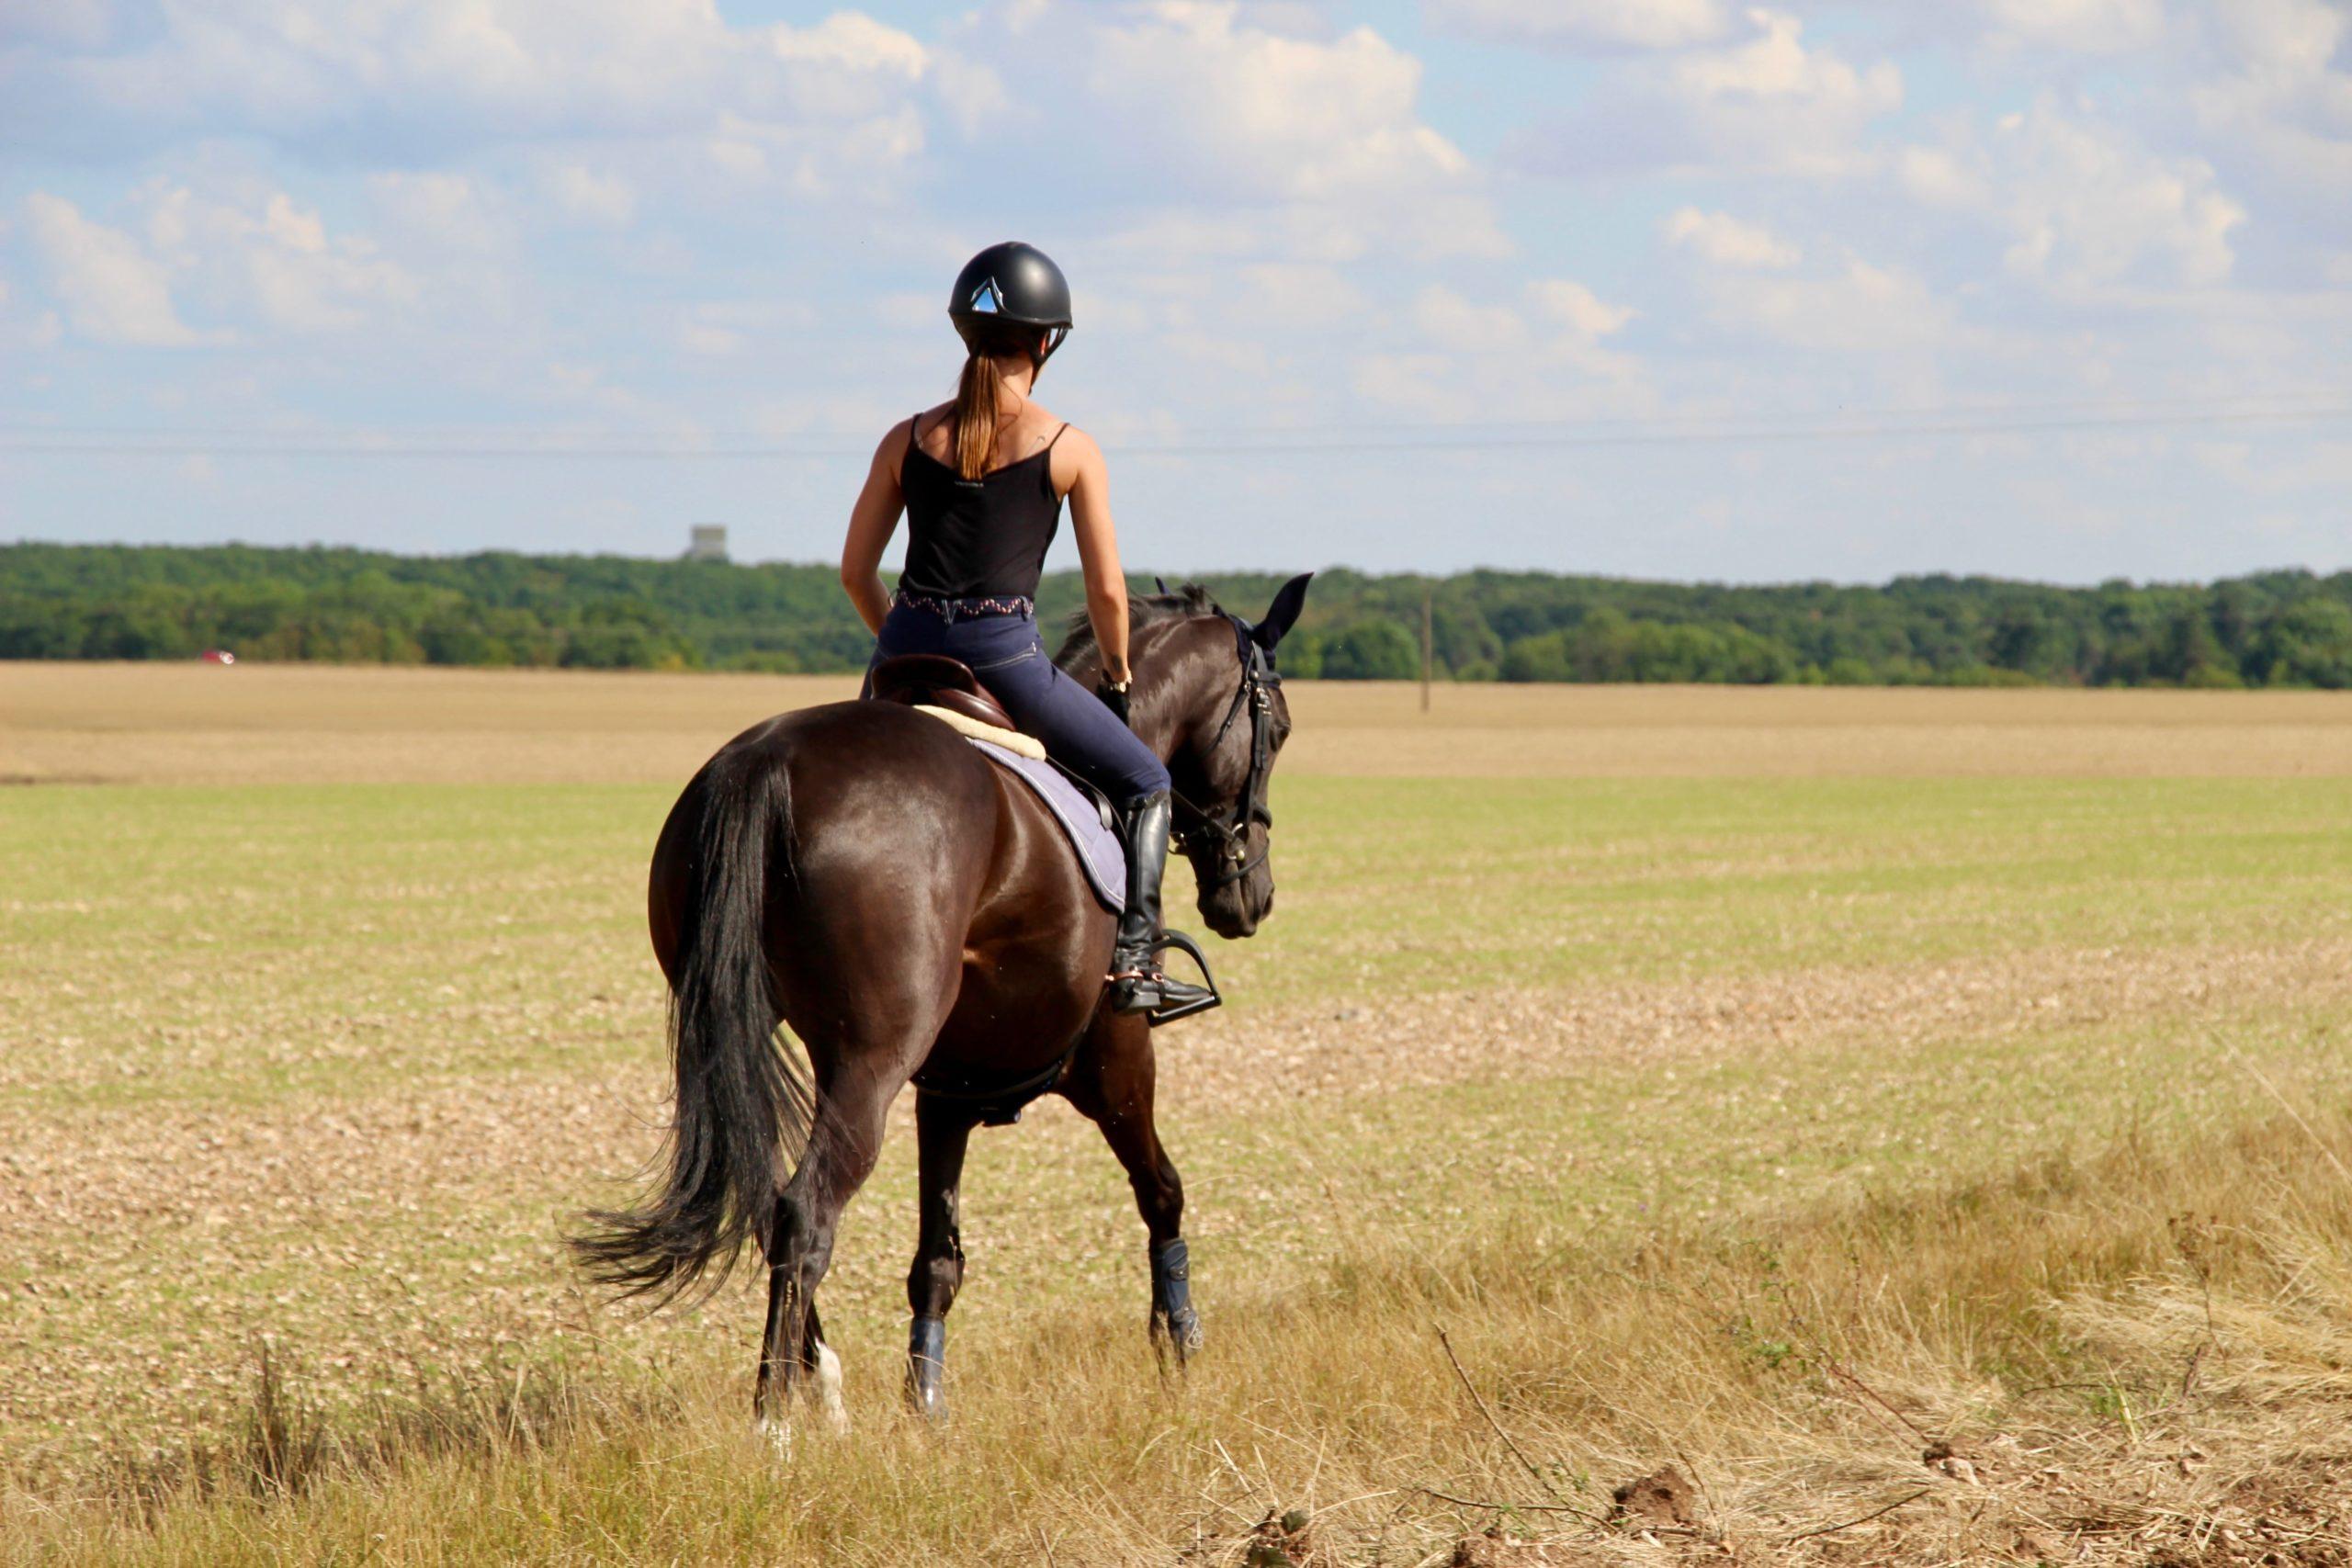 Equitation - hightech - innovation